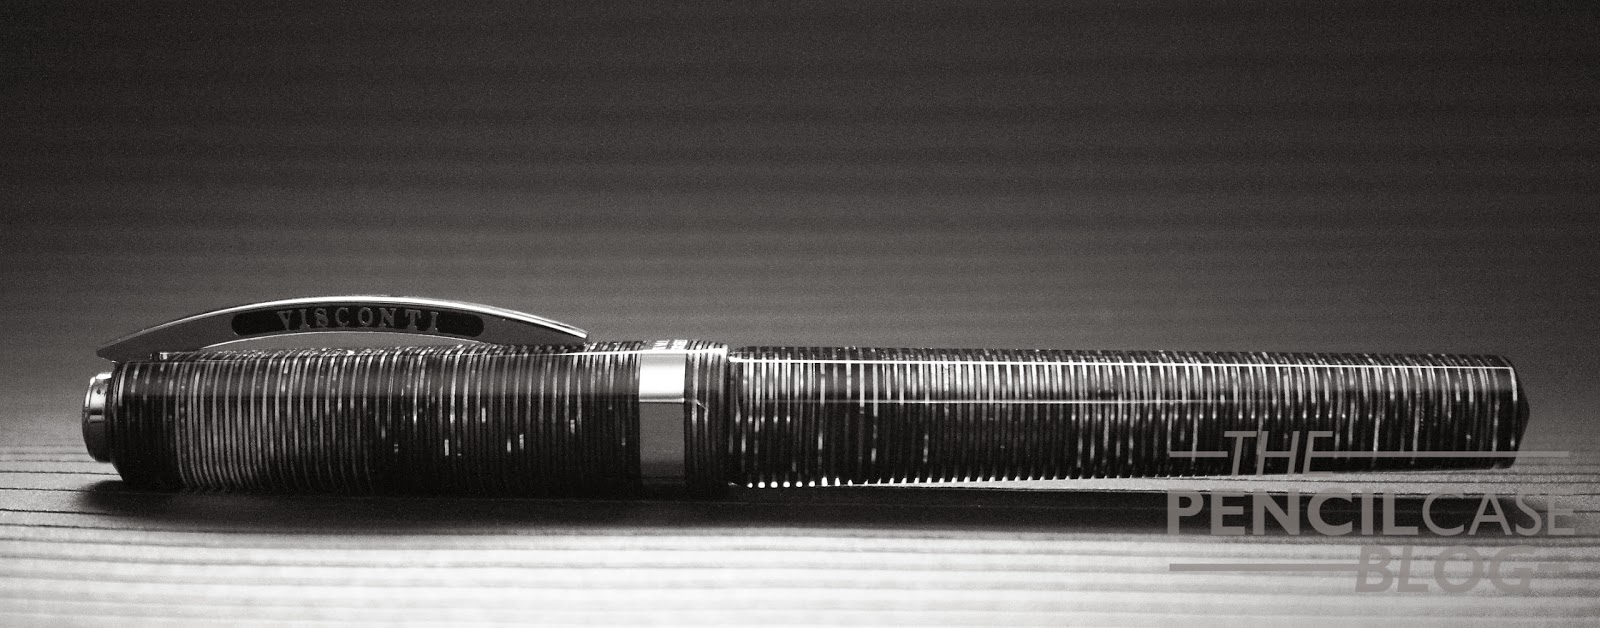 Visconti Wall Street The Grail Pen The Pencilcase